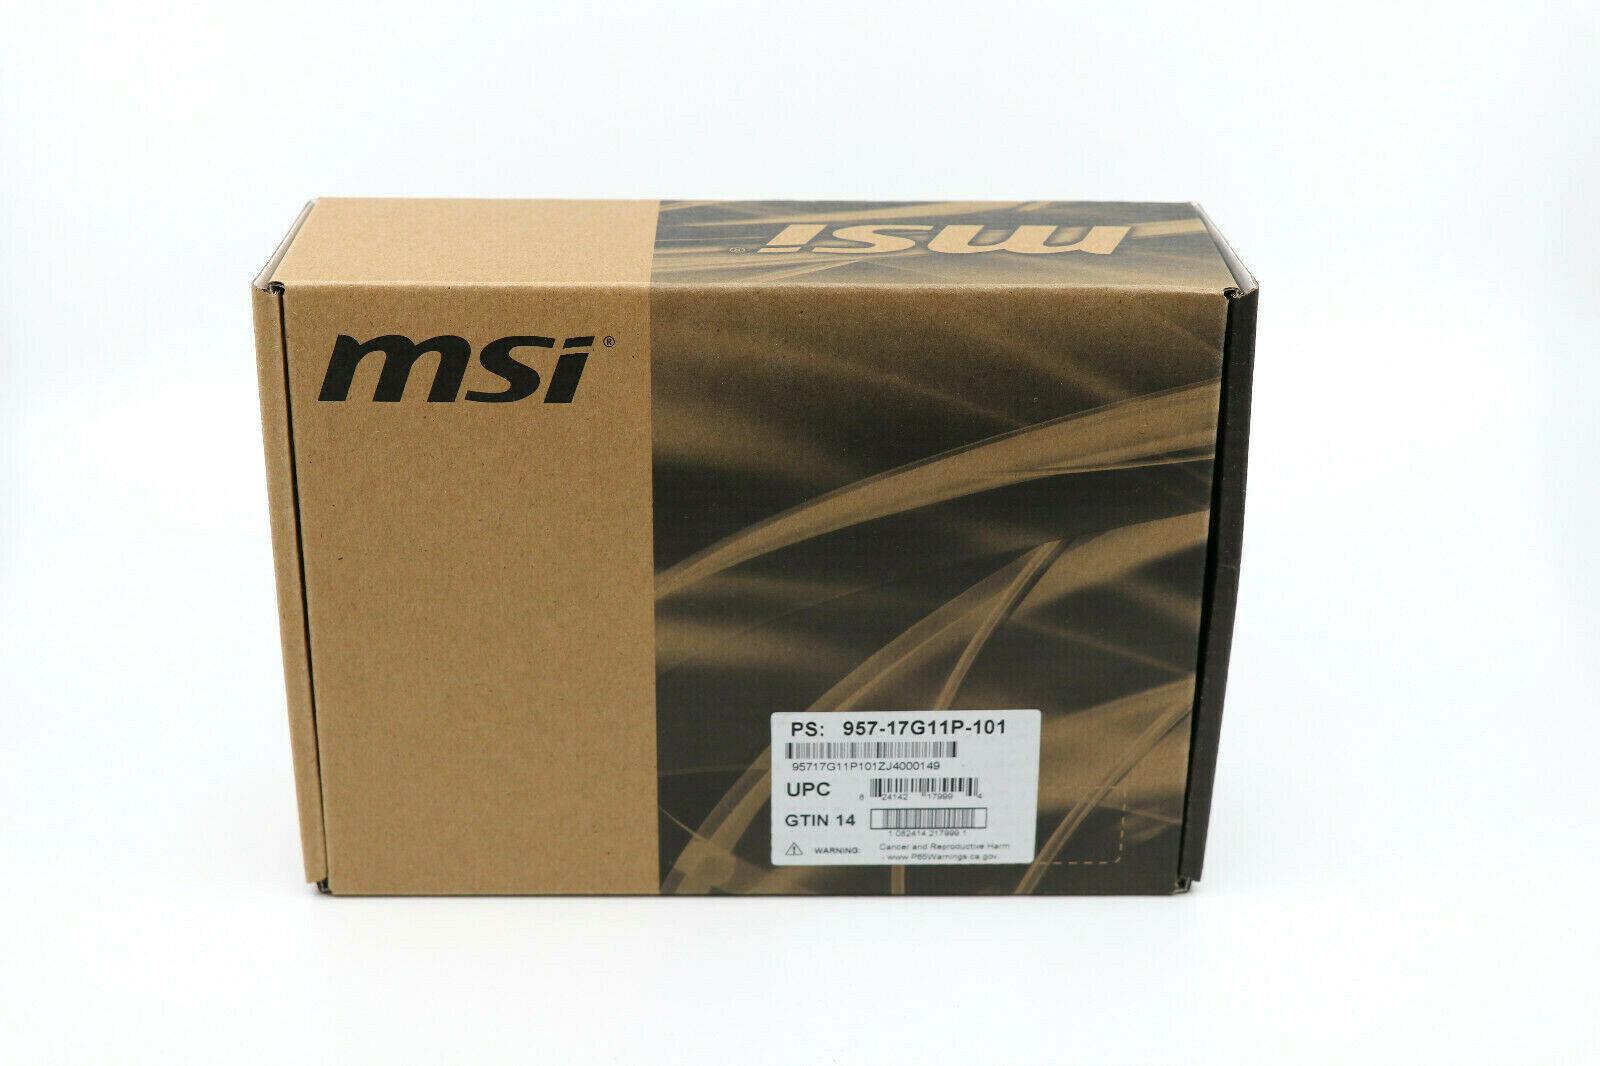 MSI GS75 STEALTH 17.3 Gaming Laptop (Core i7-9750H/32GB/1TB SSD/RTX 2080 Max Q)